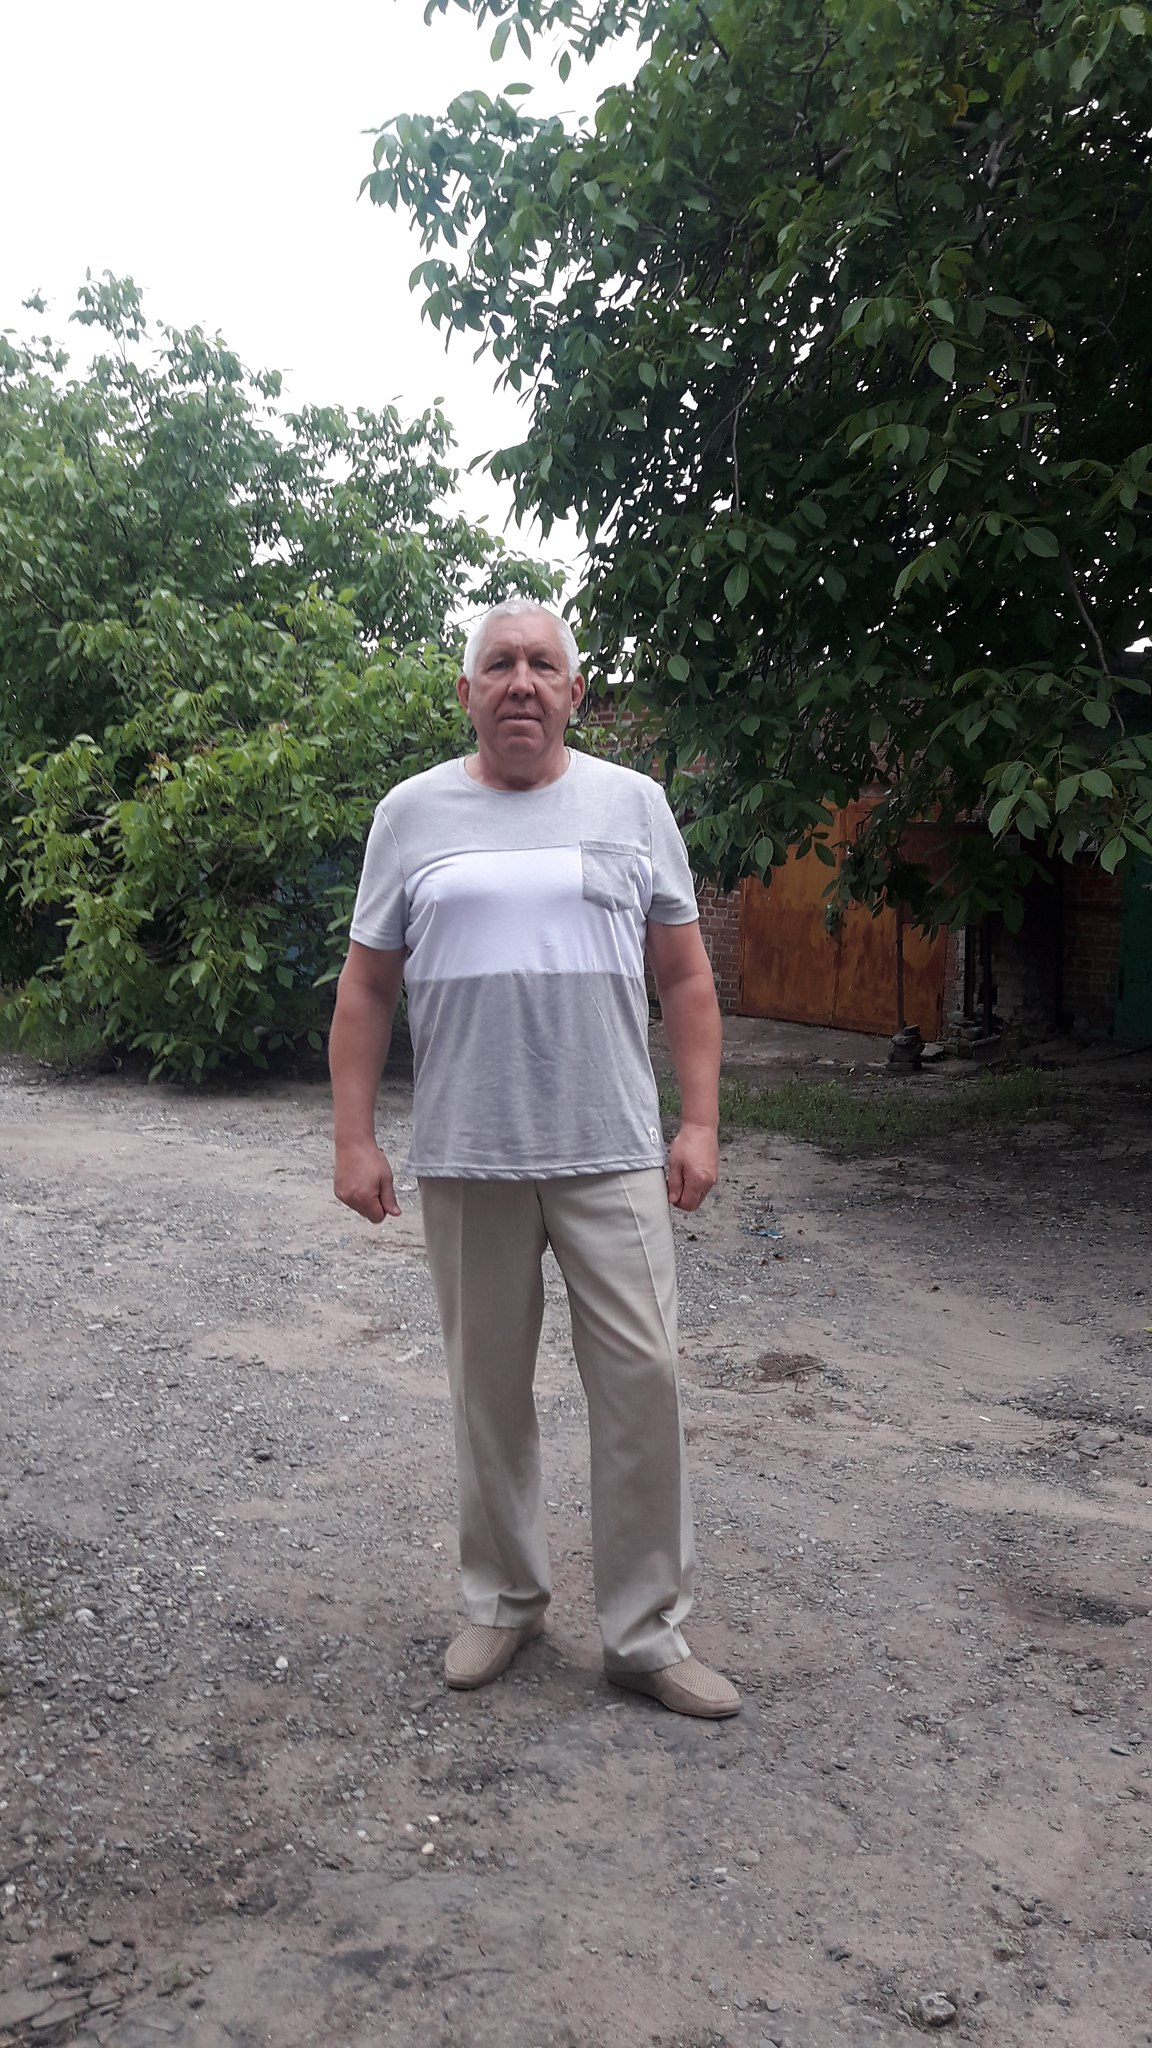 Valery Chernetsov - 4 июля 2021 в 10:27